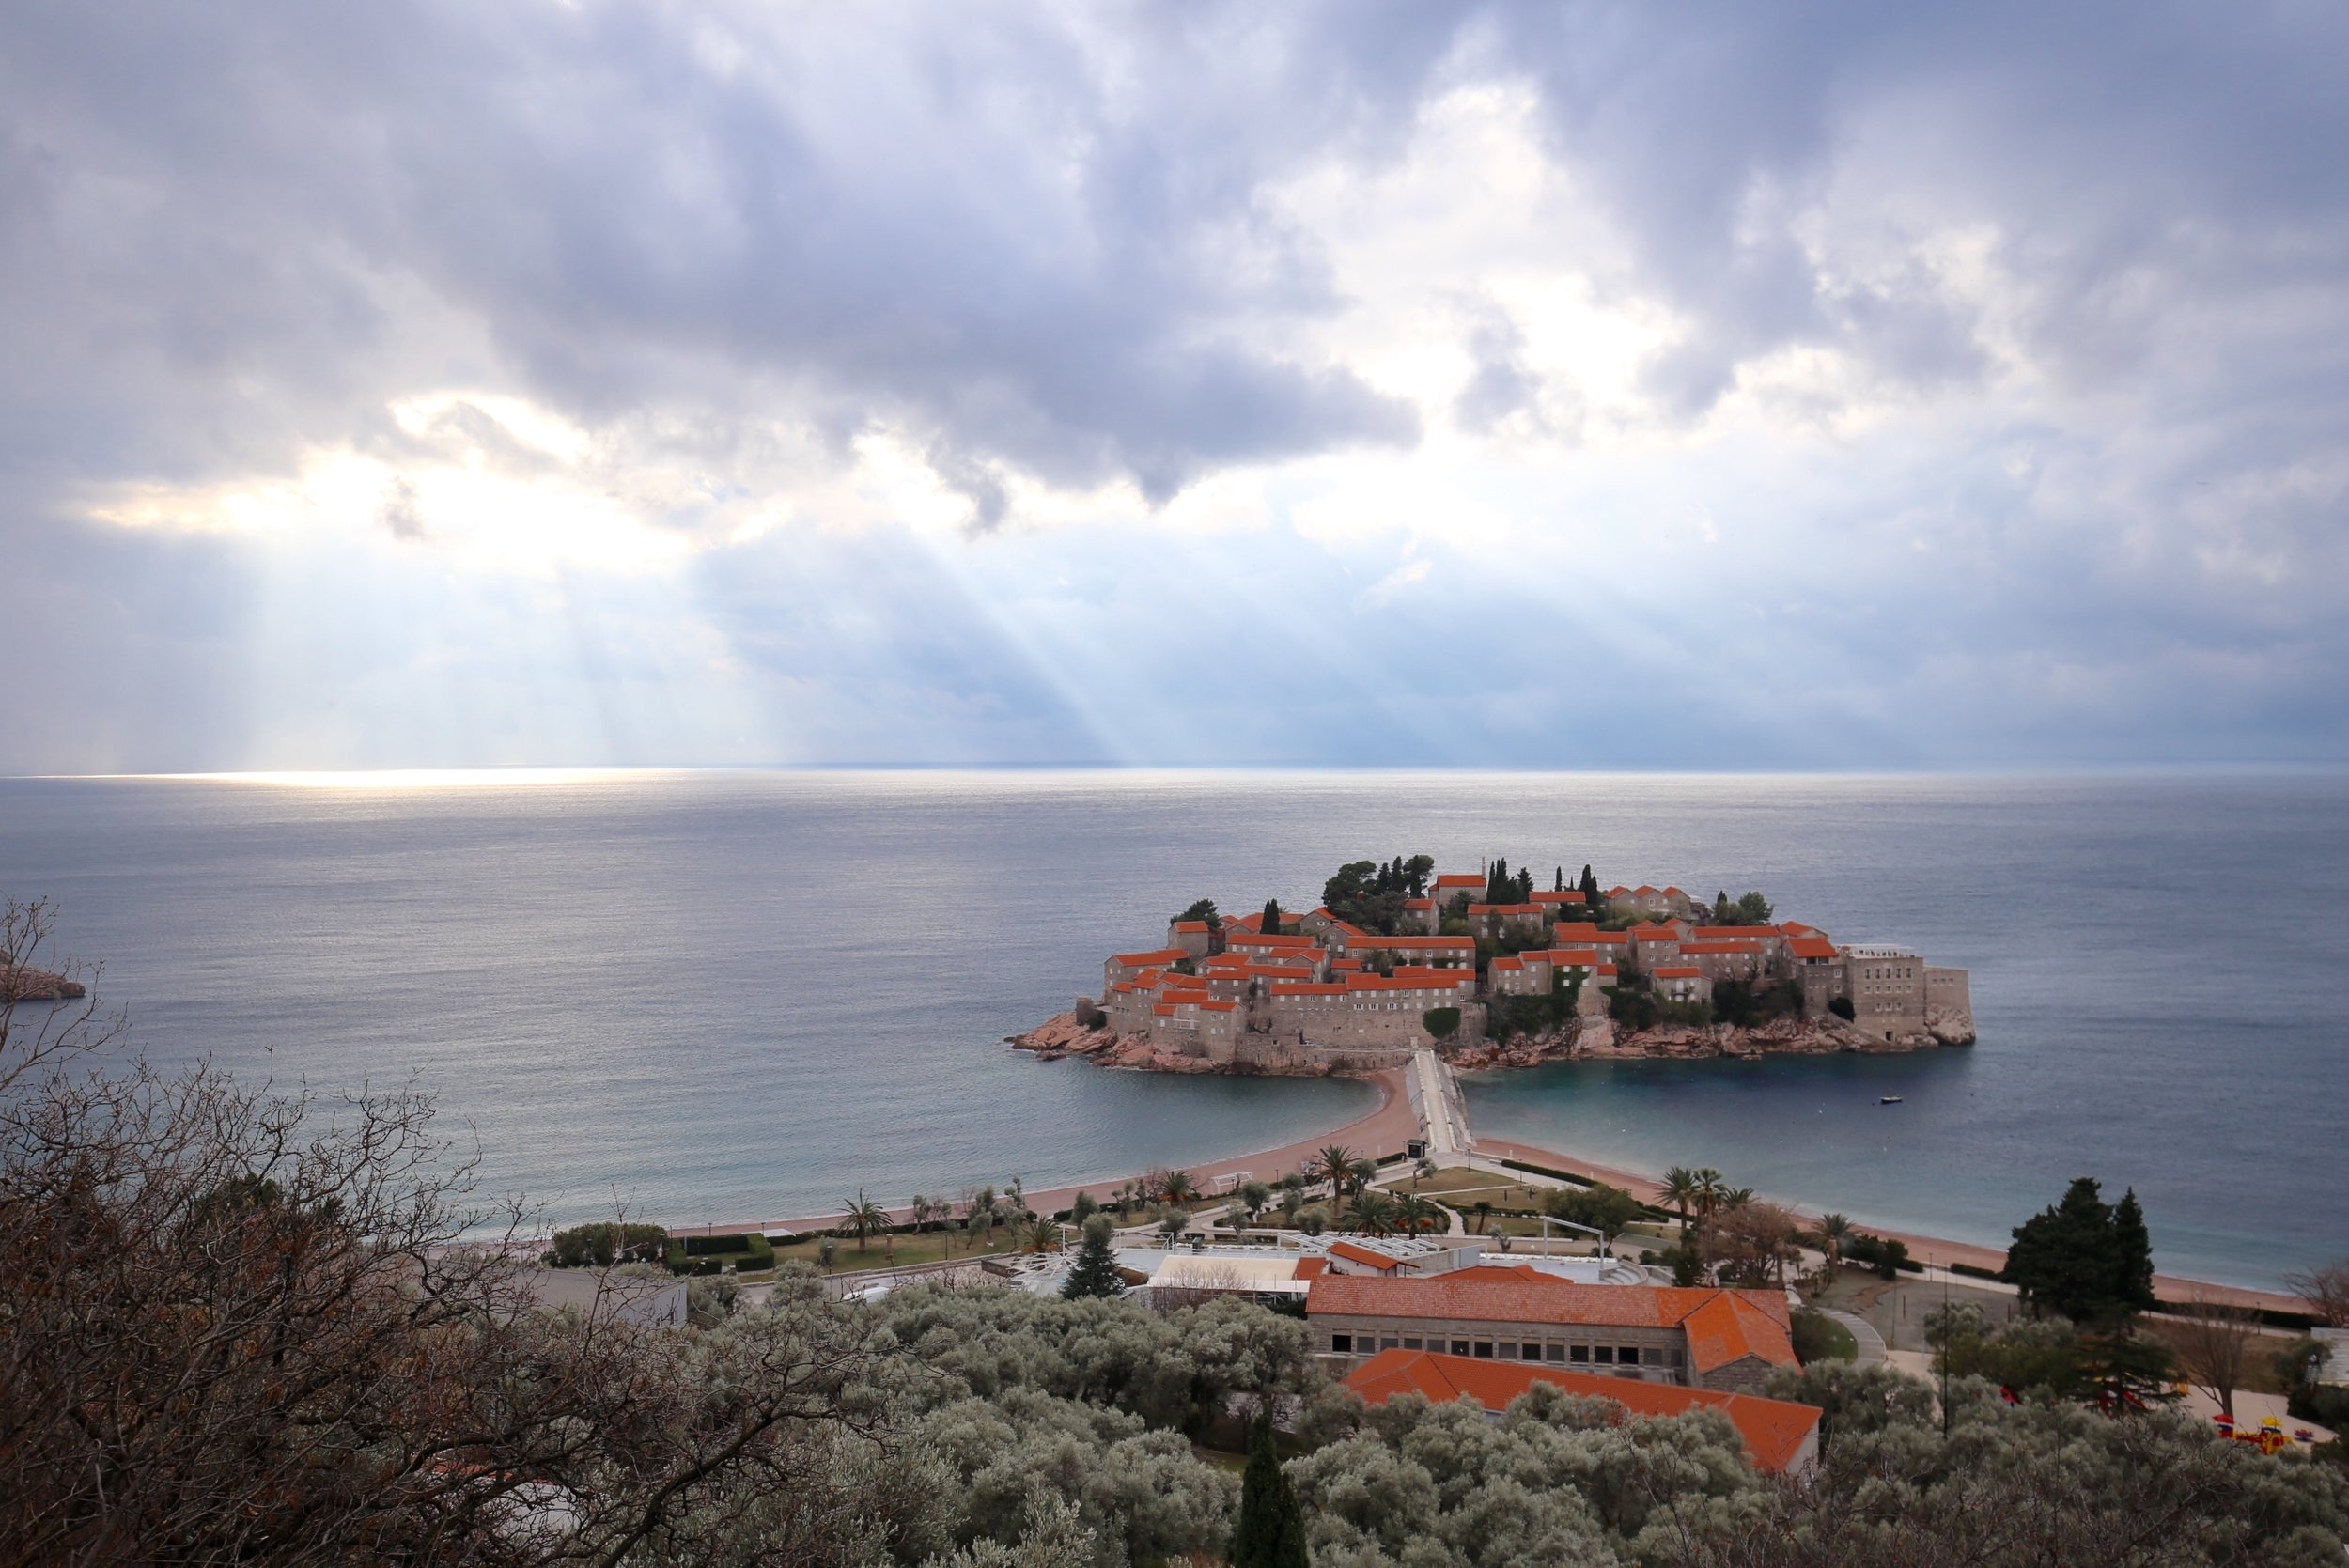 The small island of Sveti Stefan, under the sun's rays, Montenegro.